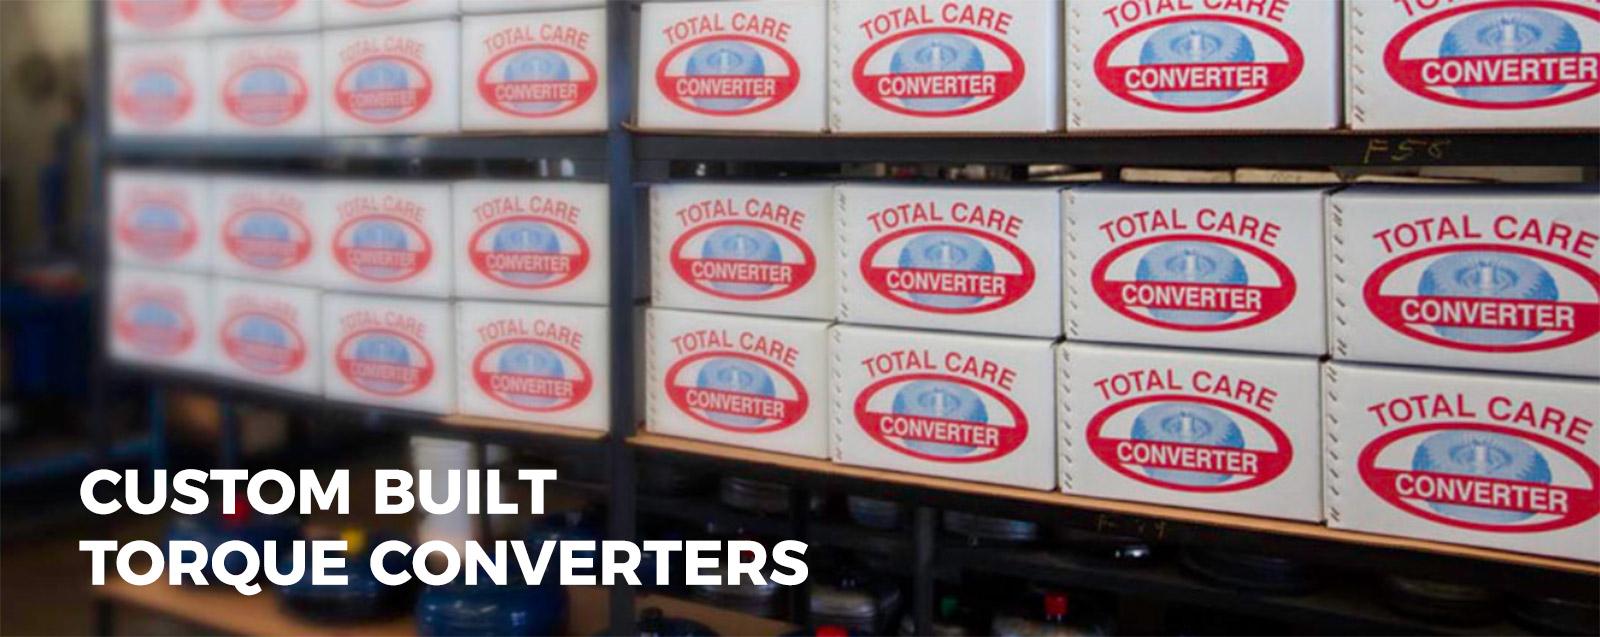 Custom Built Torque Converters